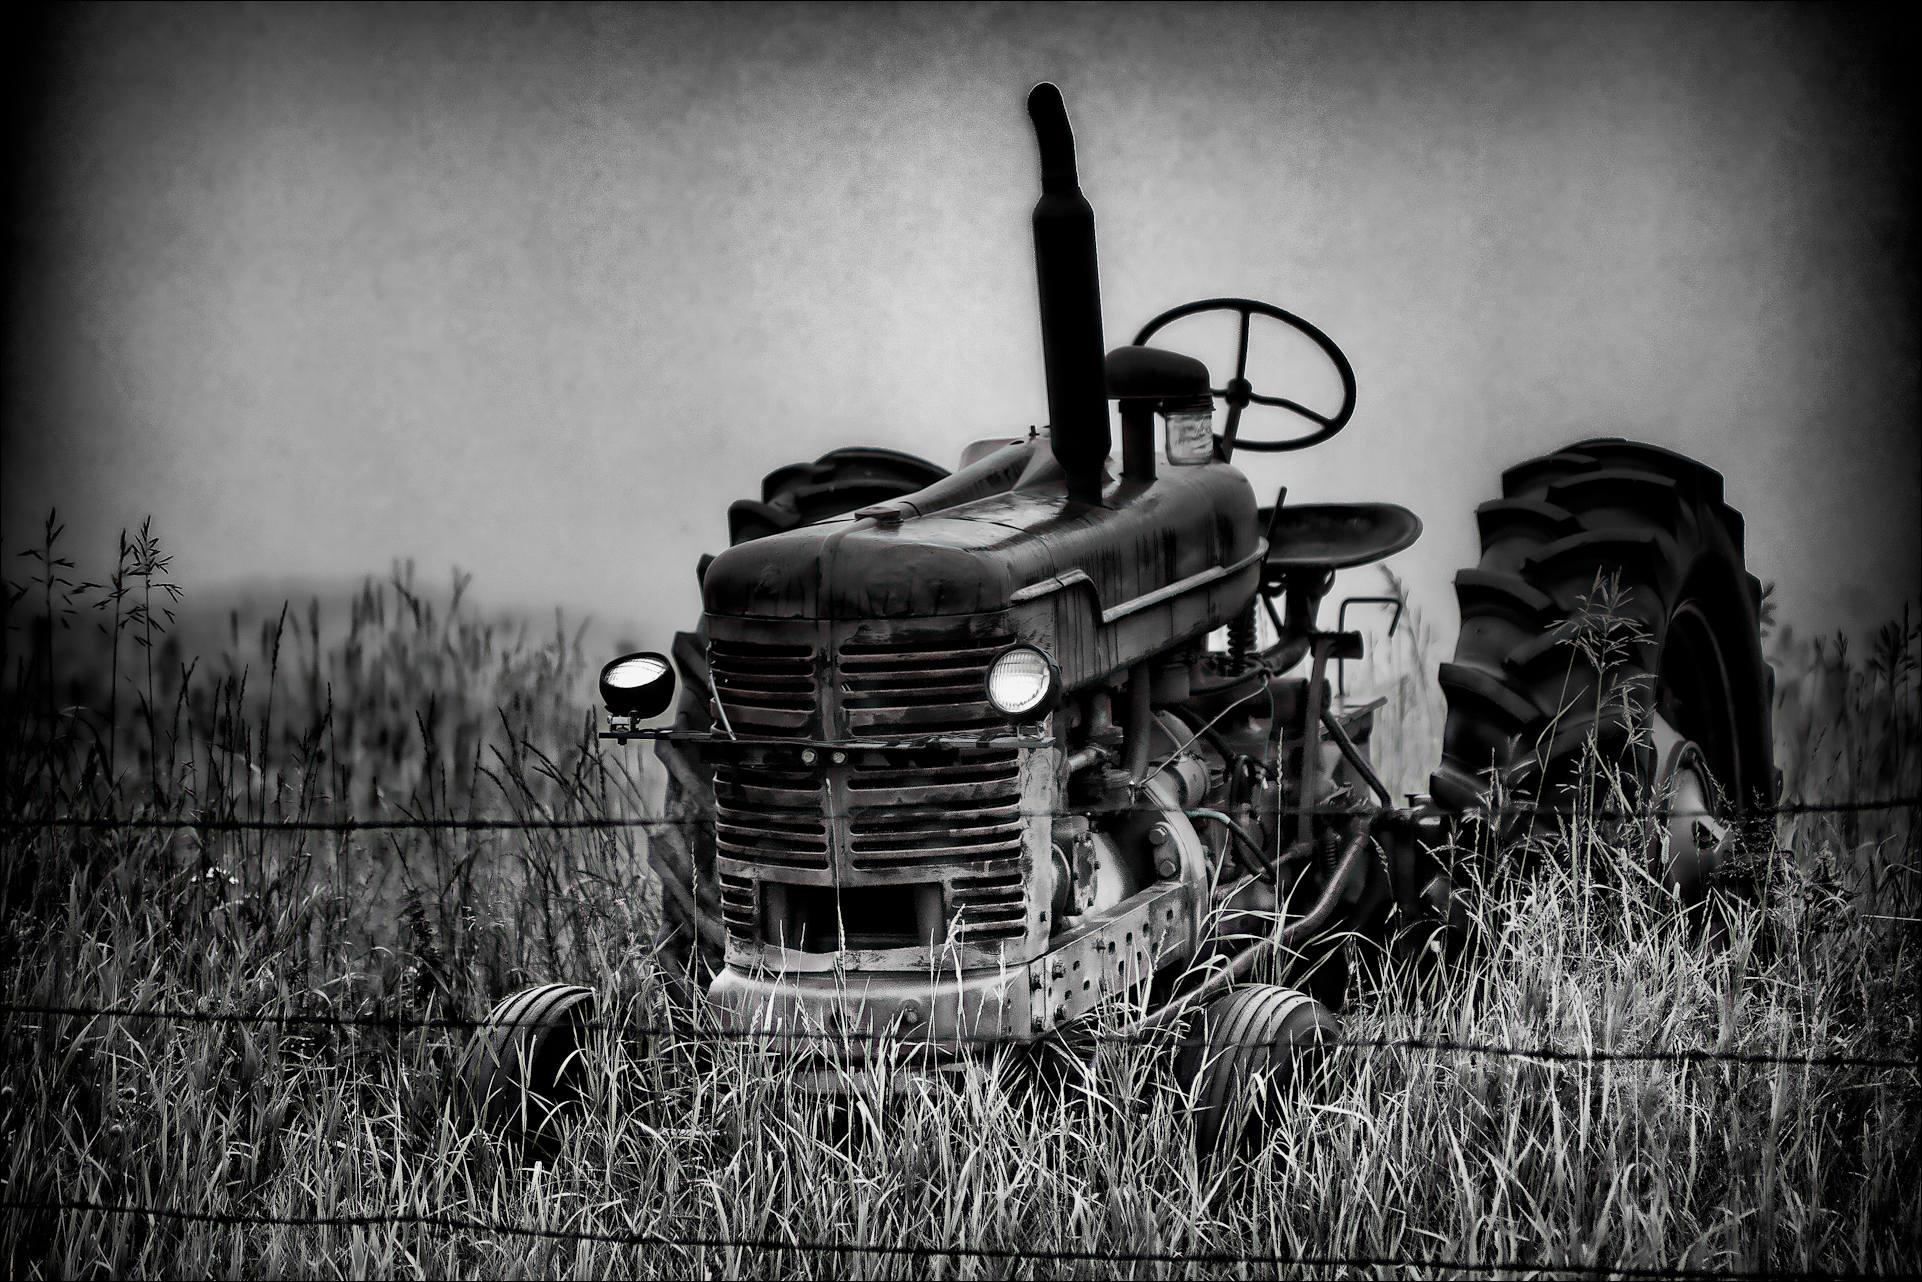 Old Tractor Farm Old Tractor Farm HD Wallpaper 1922x1282